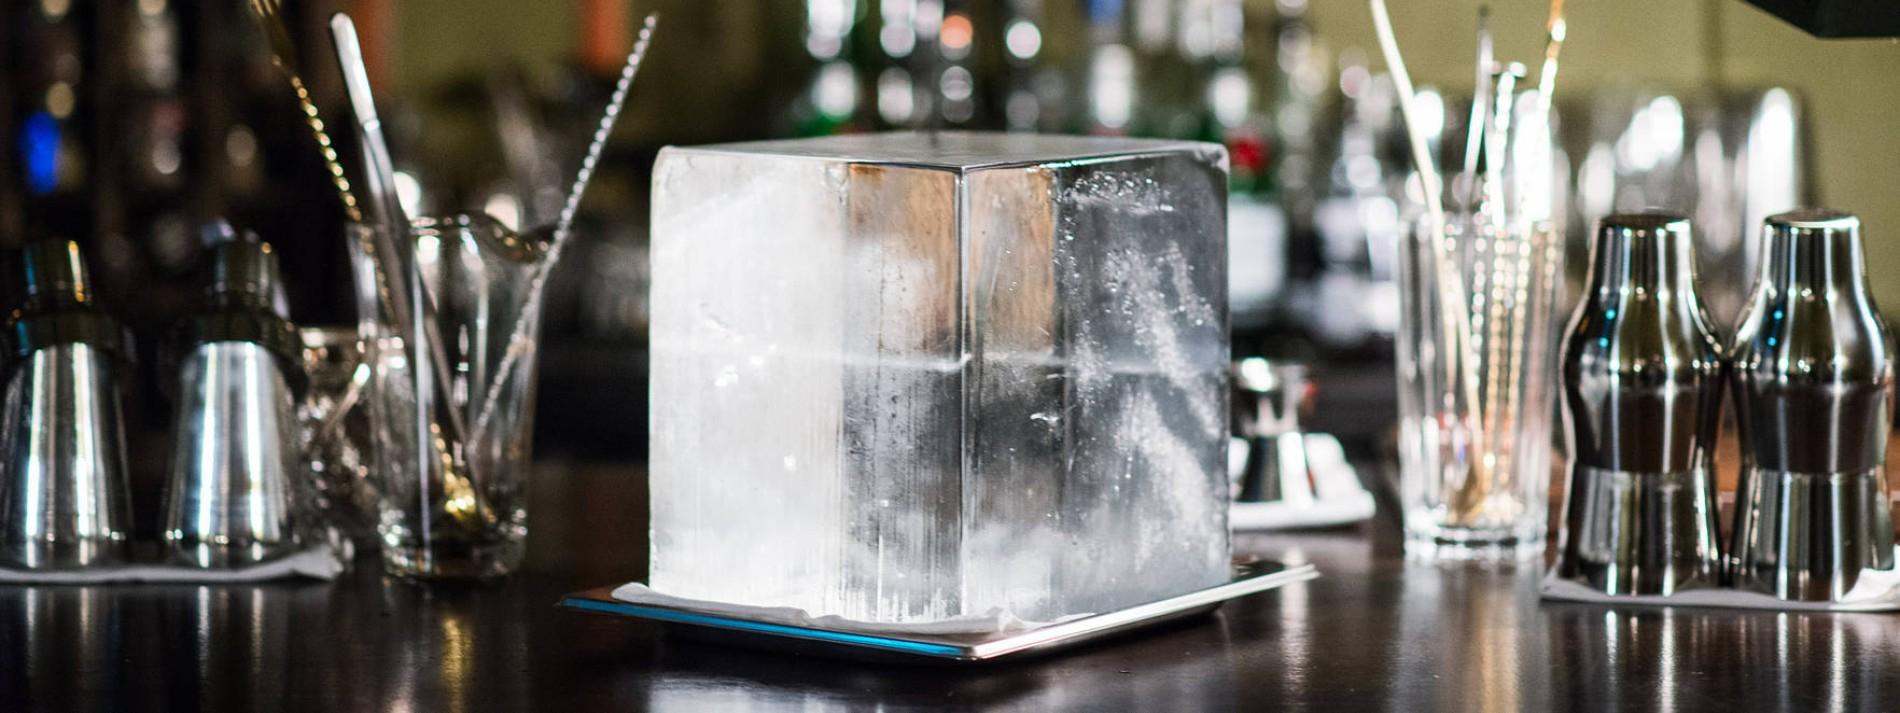 Wann Schmilzt Glas